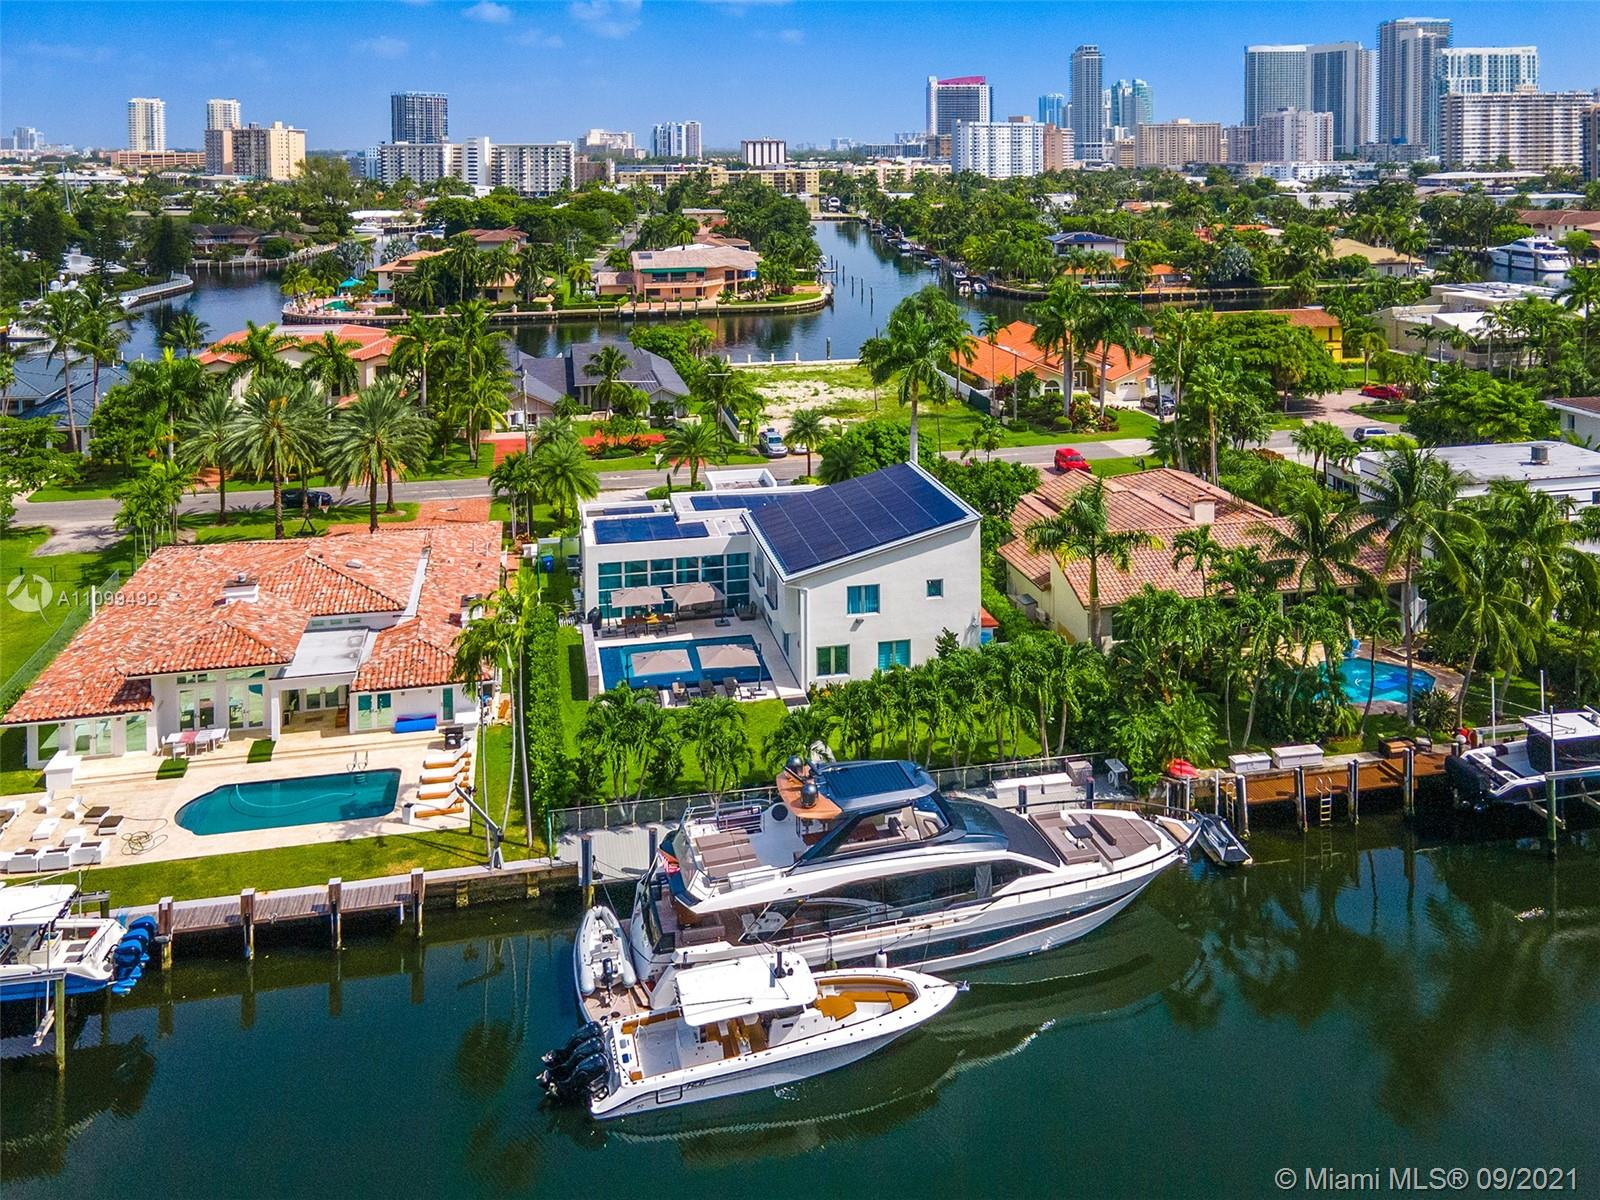 Golden Isles - 307 Holiday Dr, Hallandale Beach, FL 33009